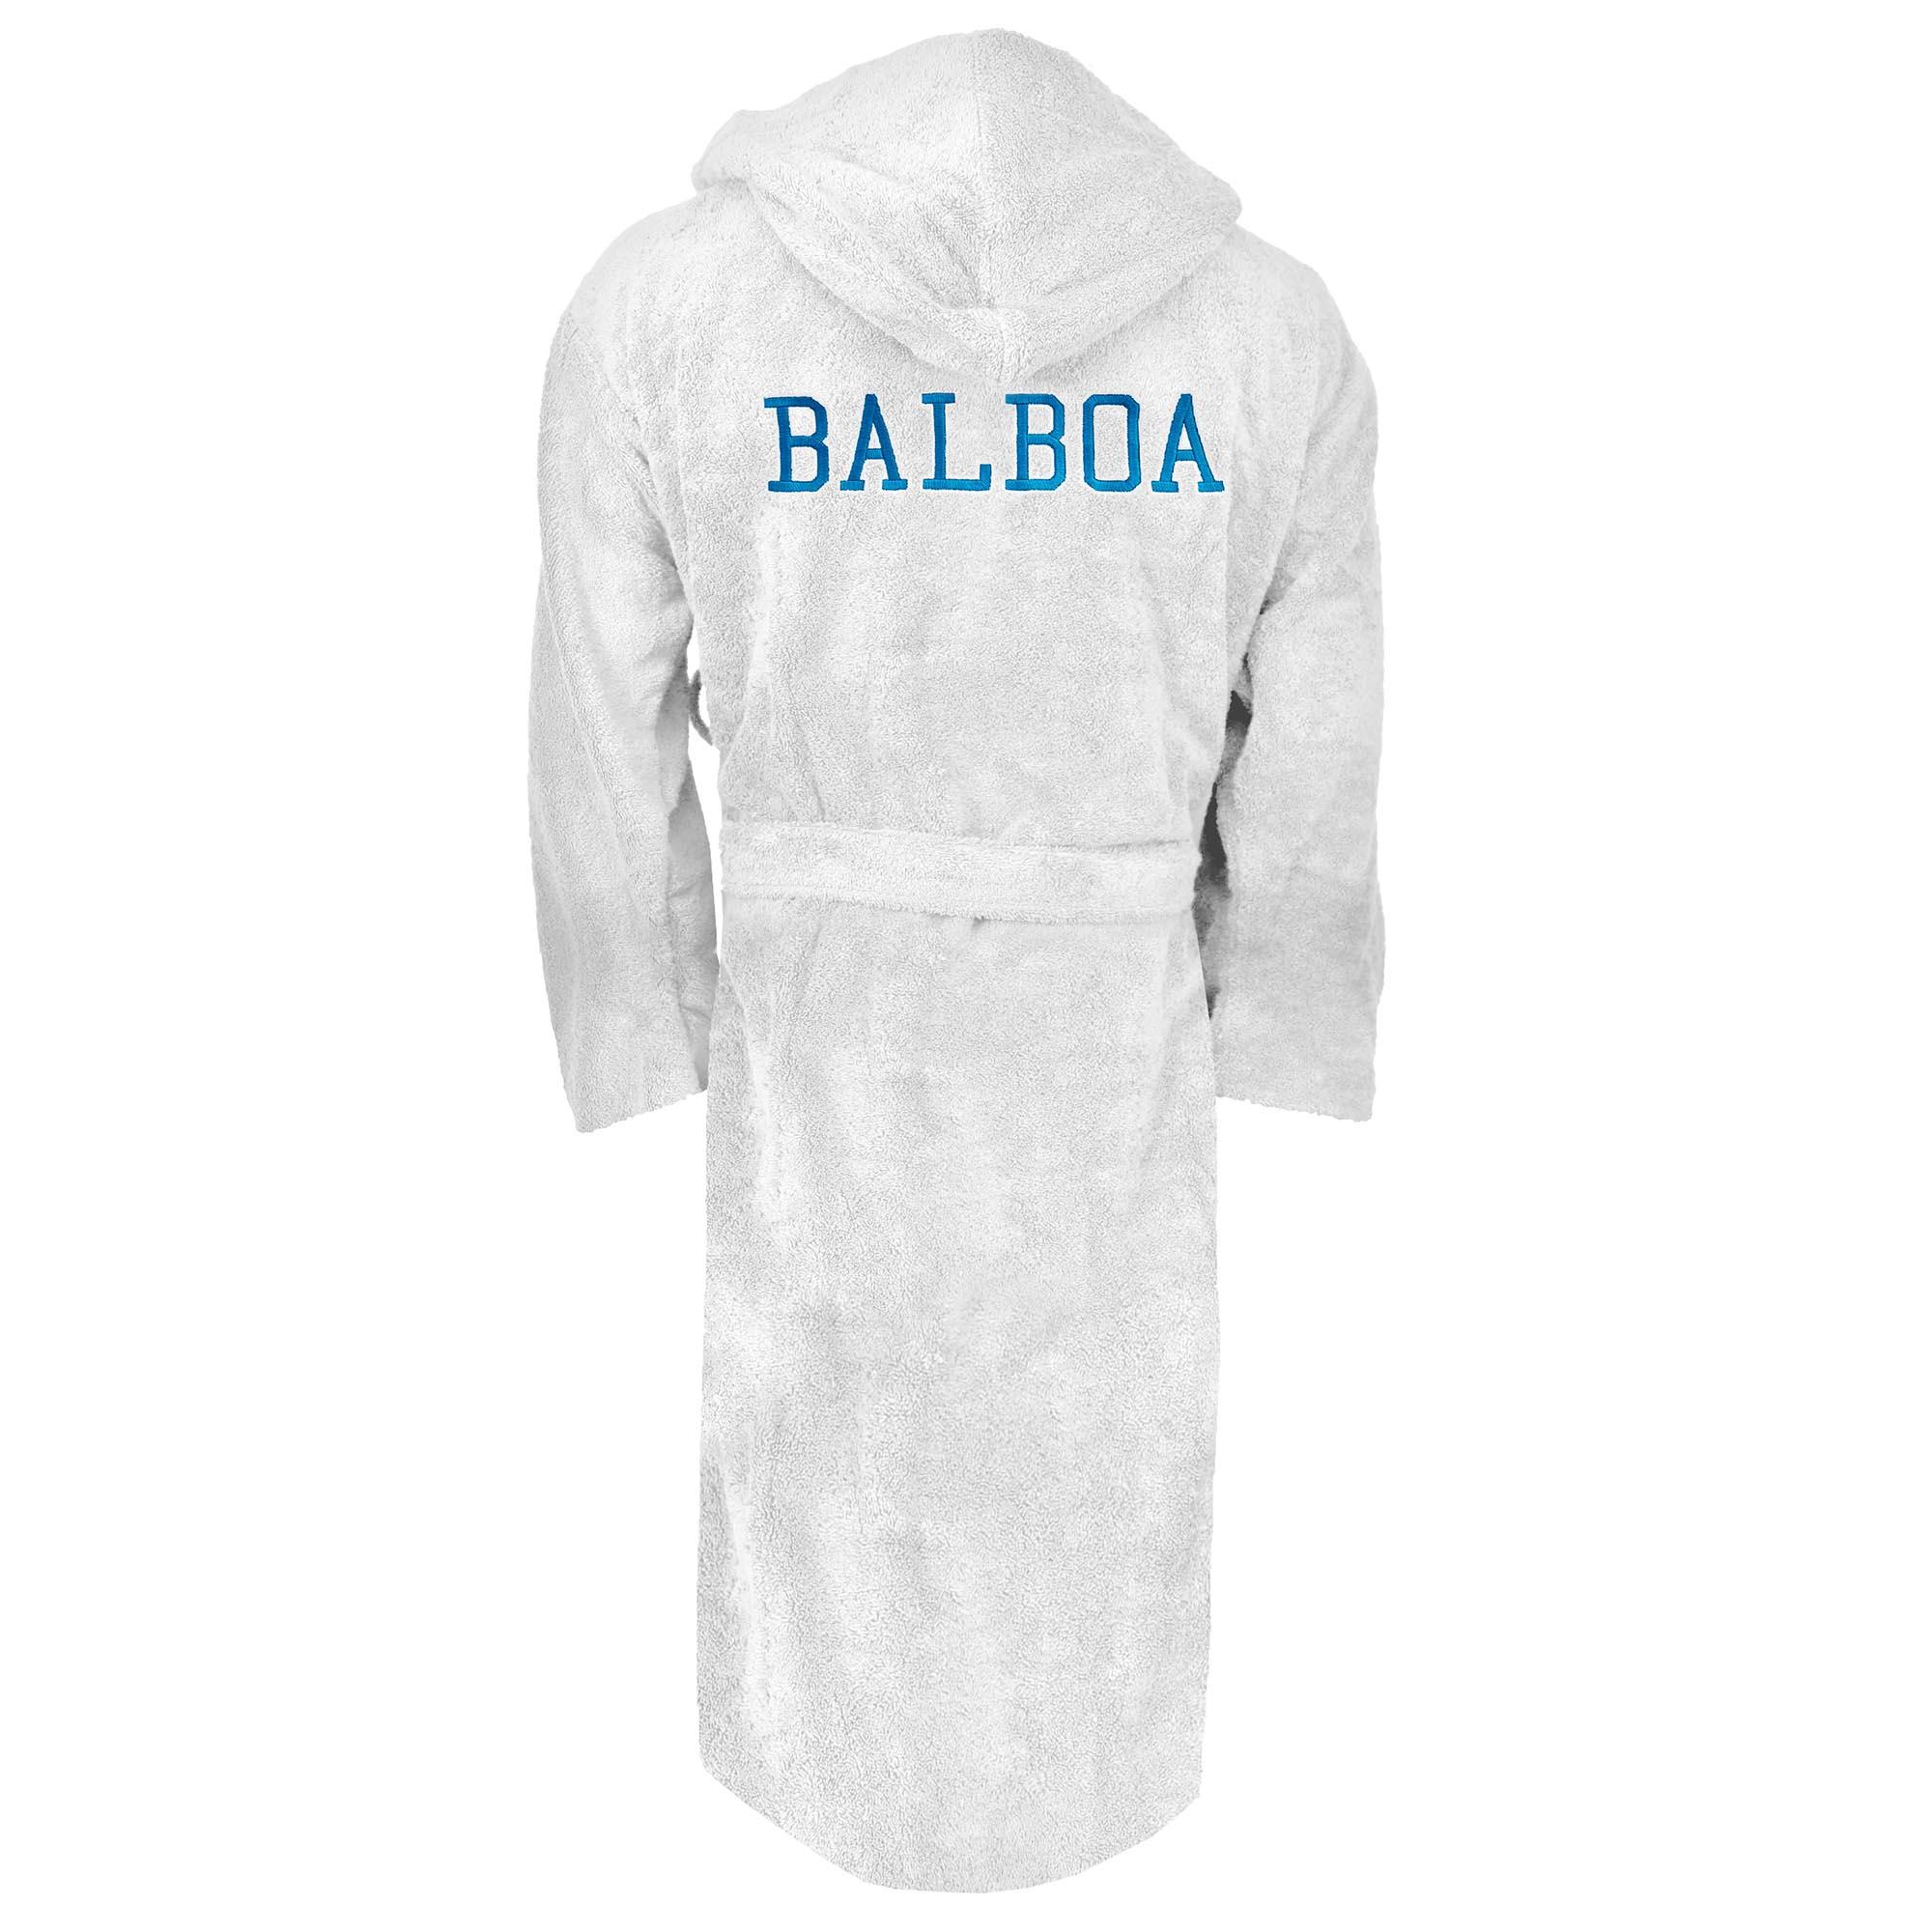 Rocky Balboa Bathrobe